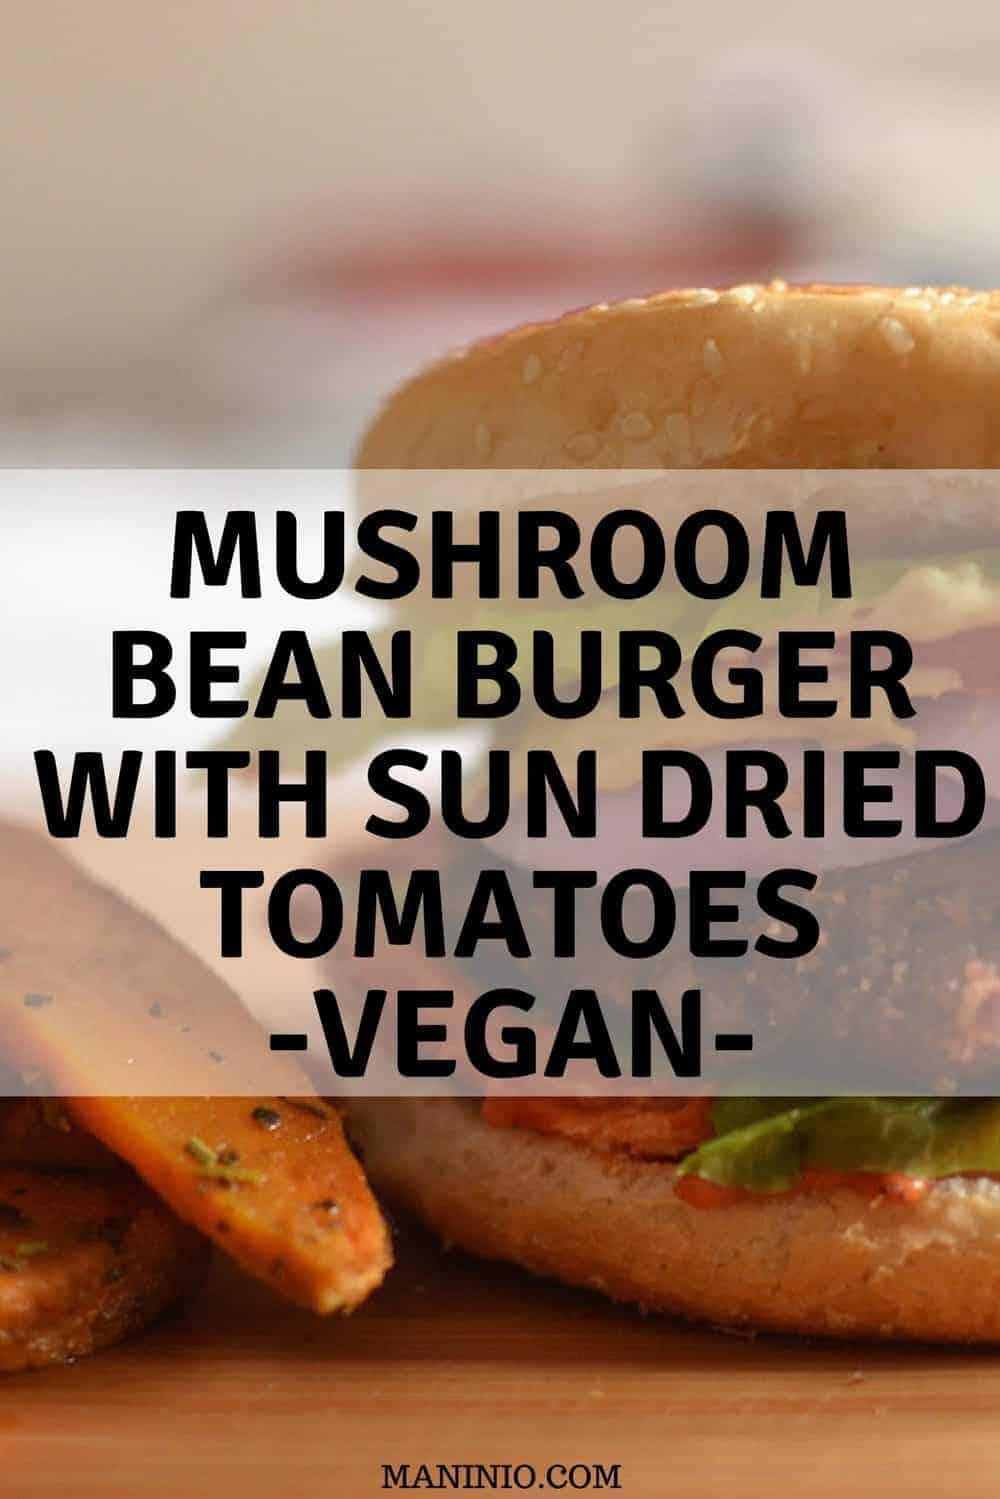 Mushroom Bean Vegan Burger with Sun-Dried Tomatoes. maninio.com #veganburgersveggie #veganbeanburger